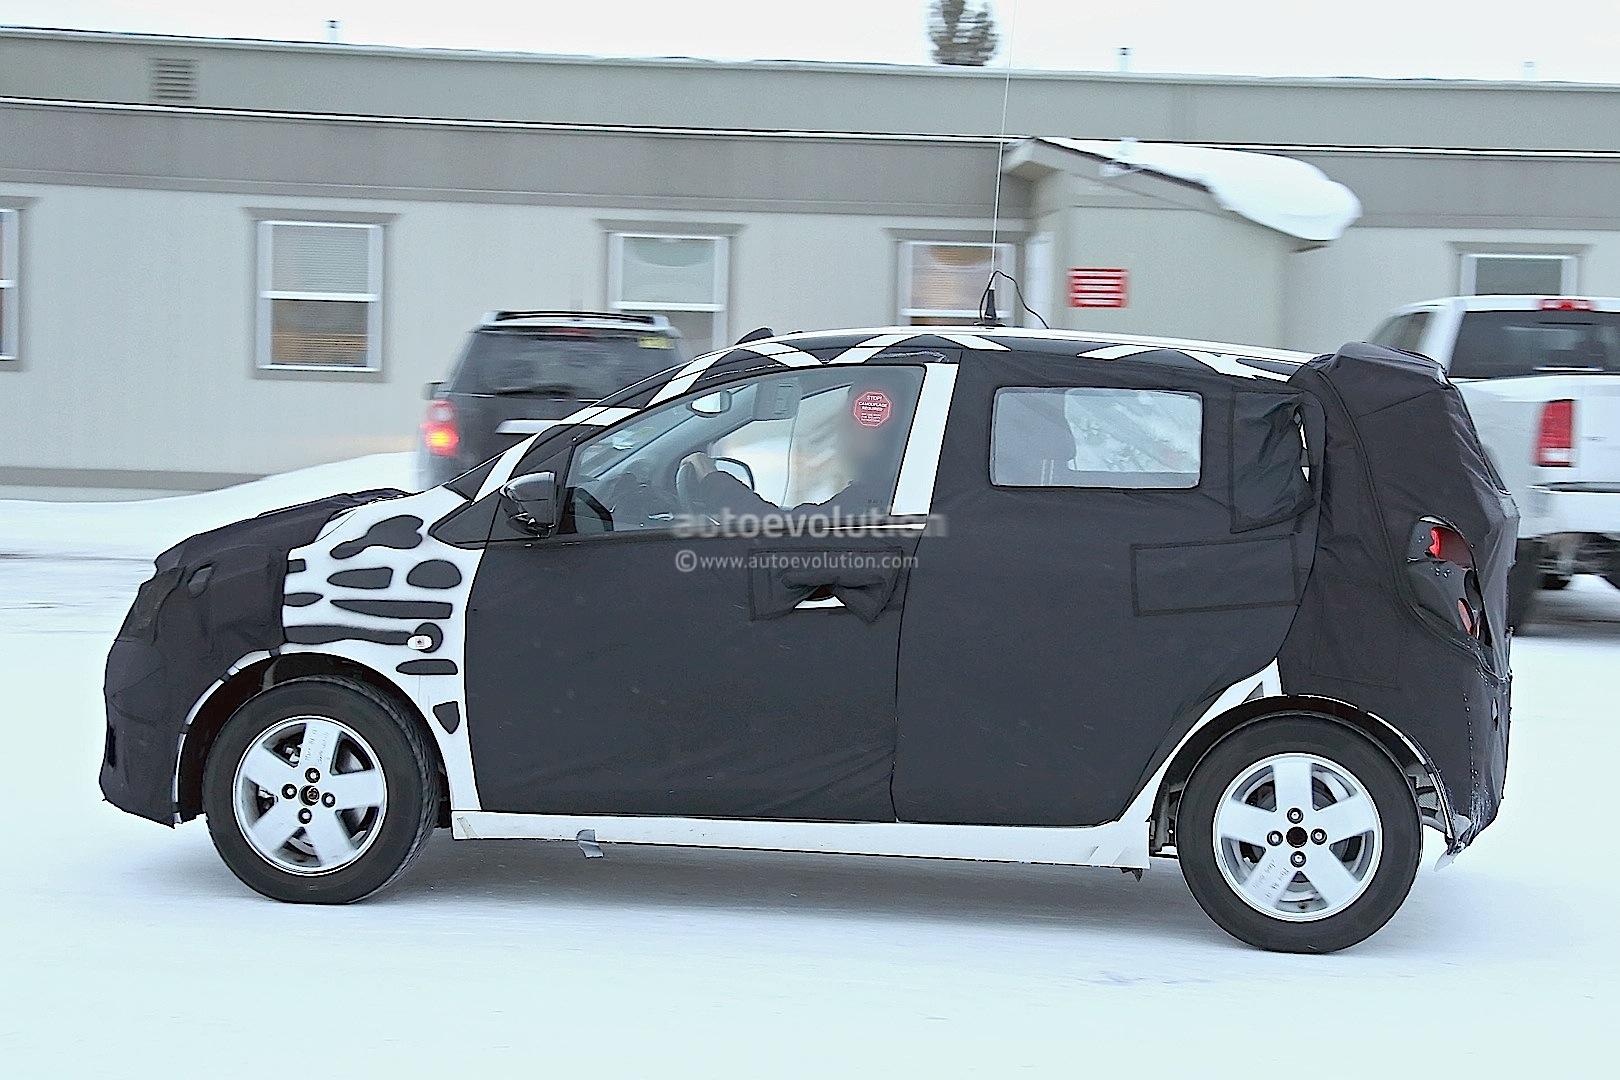 2015 - [Vauxhall/Opel] Viva / Karl Spyshots-2015-chevrolet-spark-caught-winter-testing_5